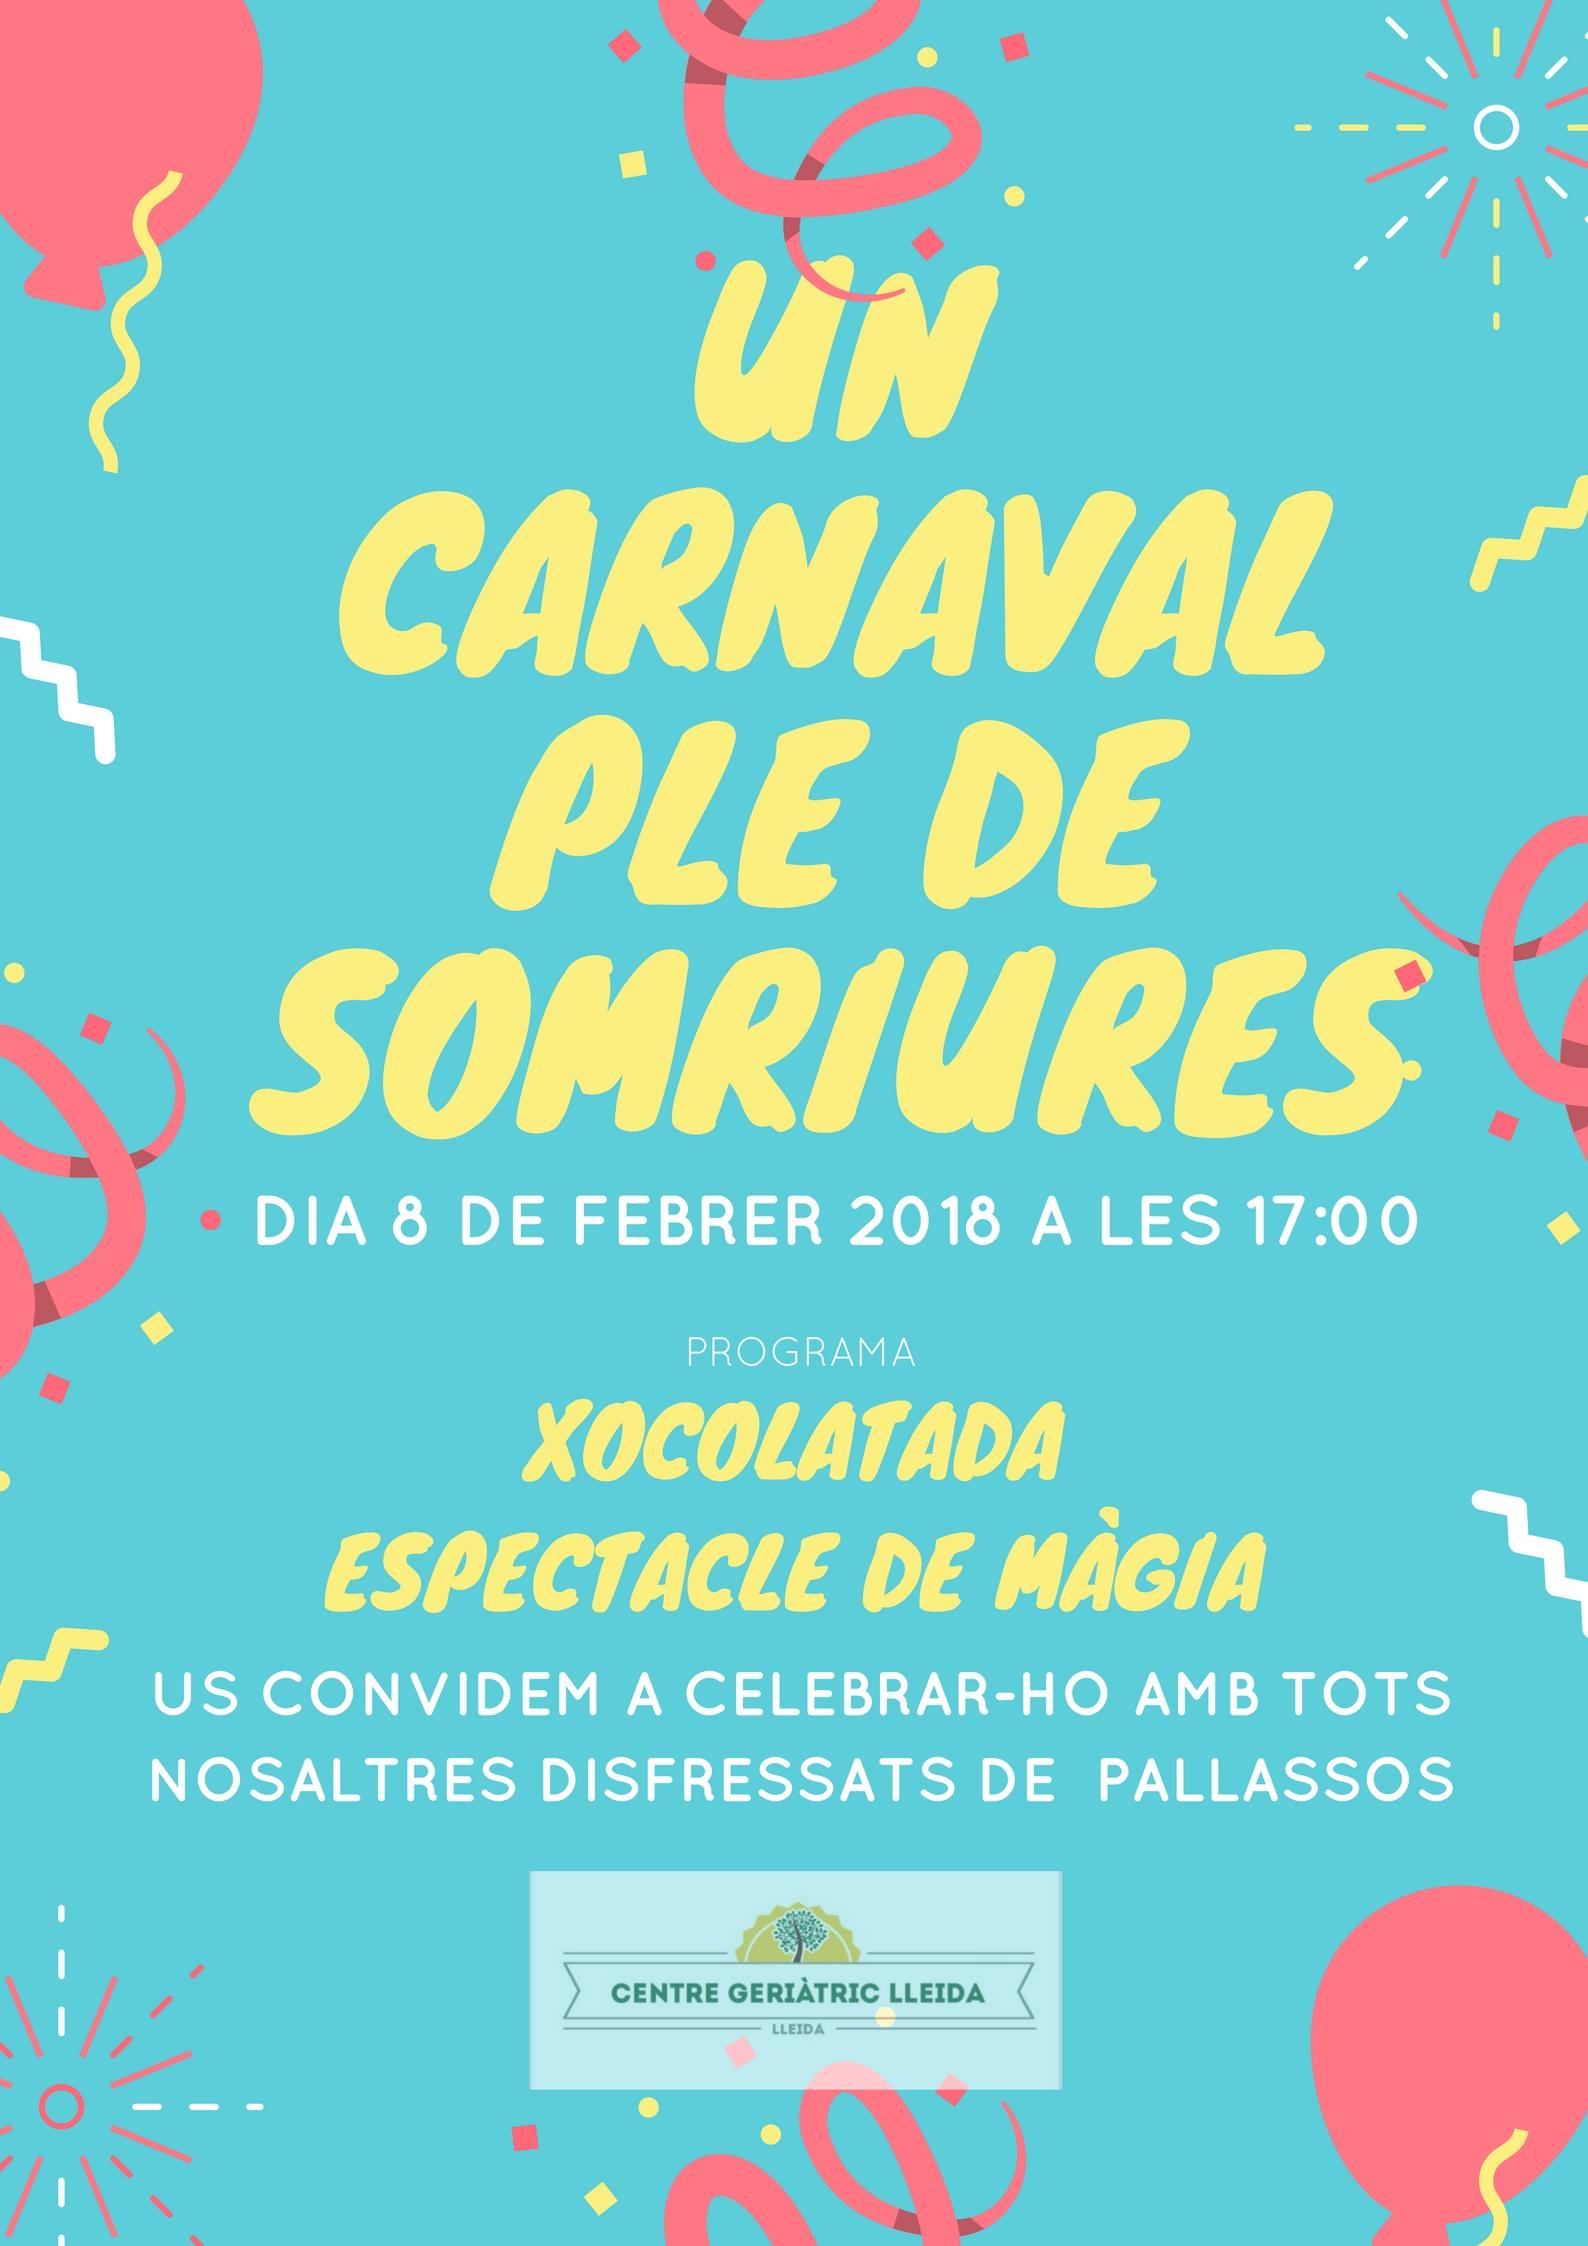 Un carnaval ple de somriures